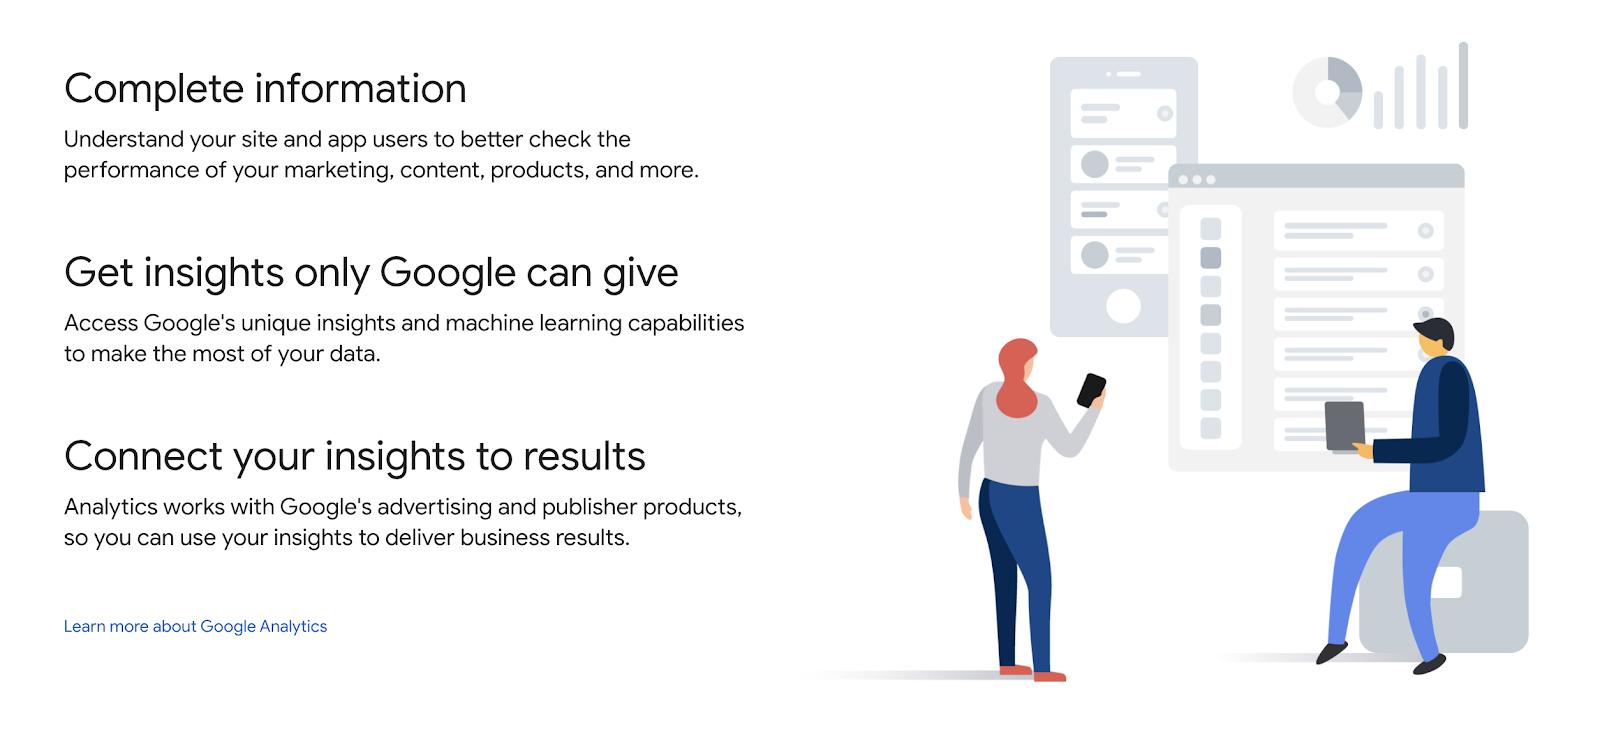 Blog Content Audit Tool: Google Analytics